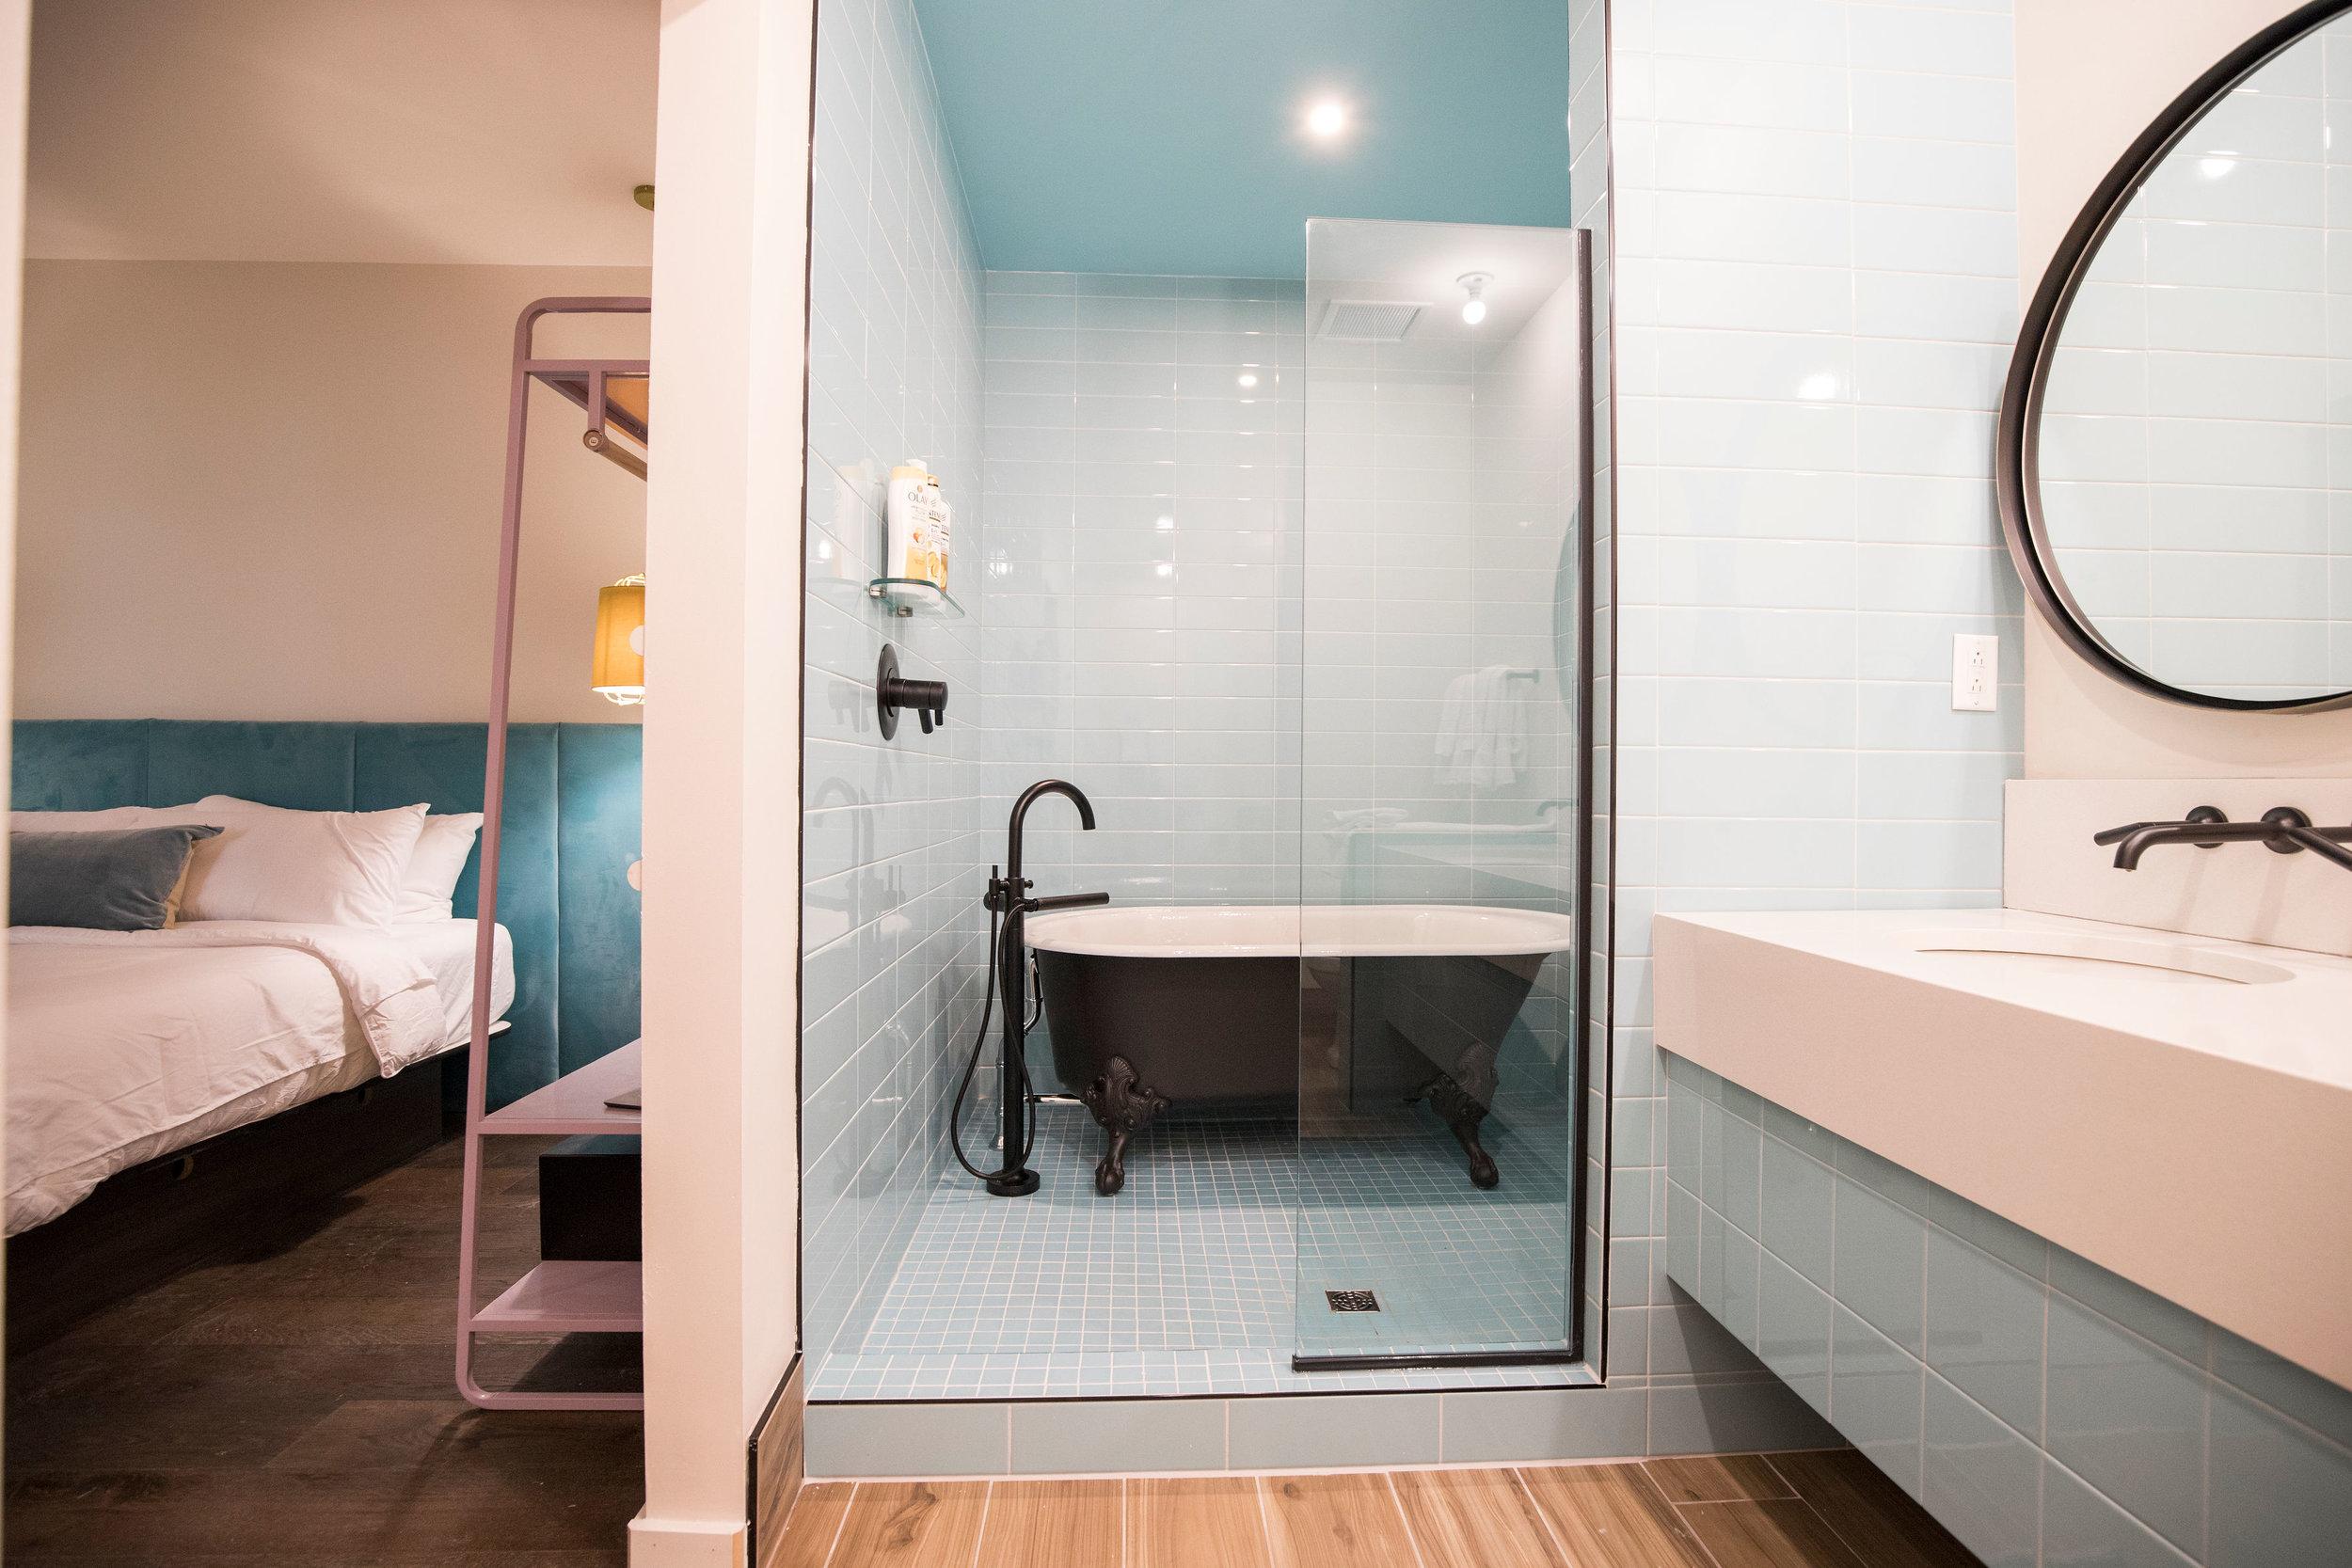 2_P bathroom.JPG